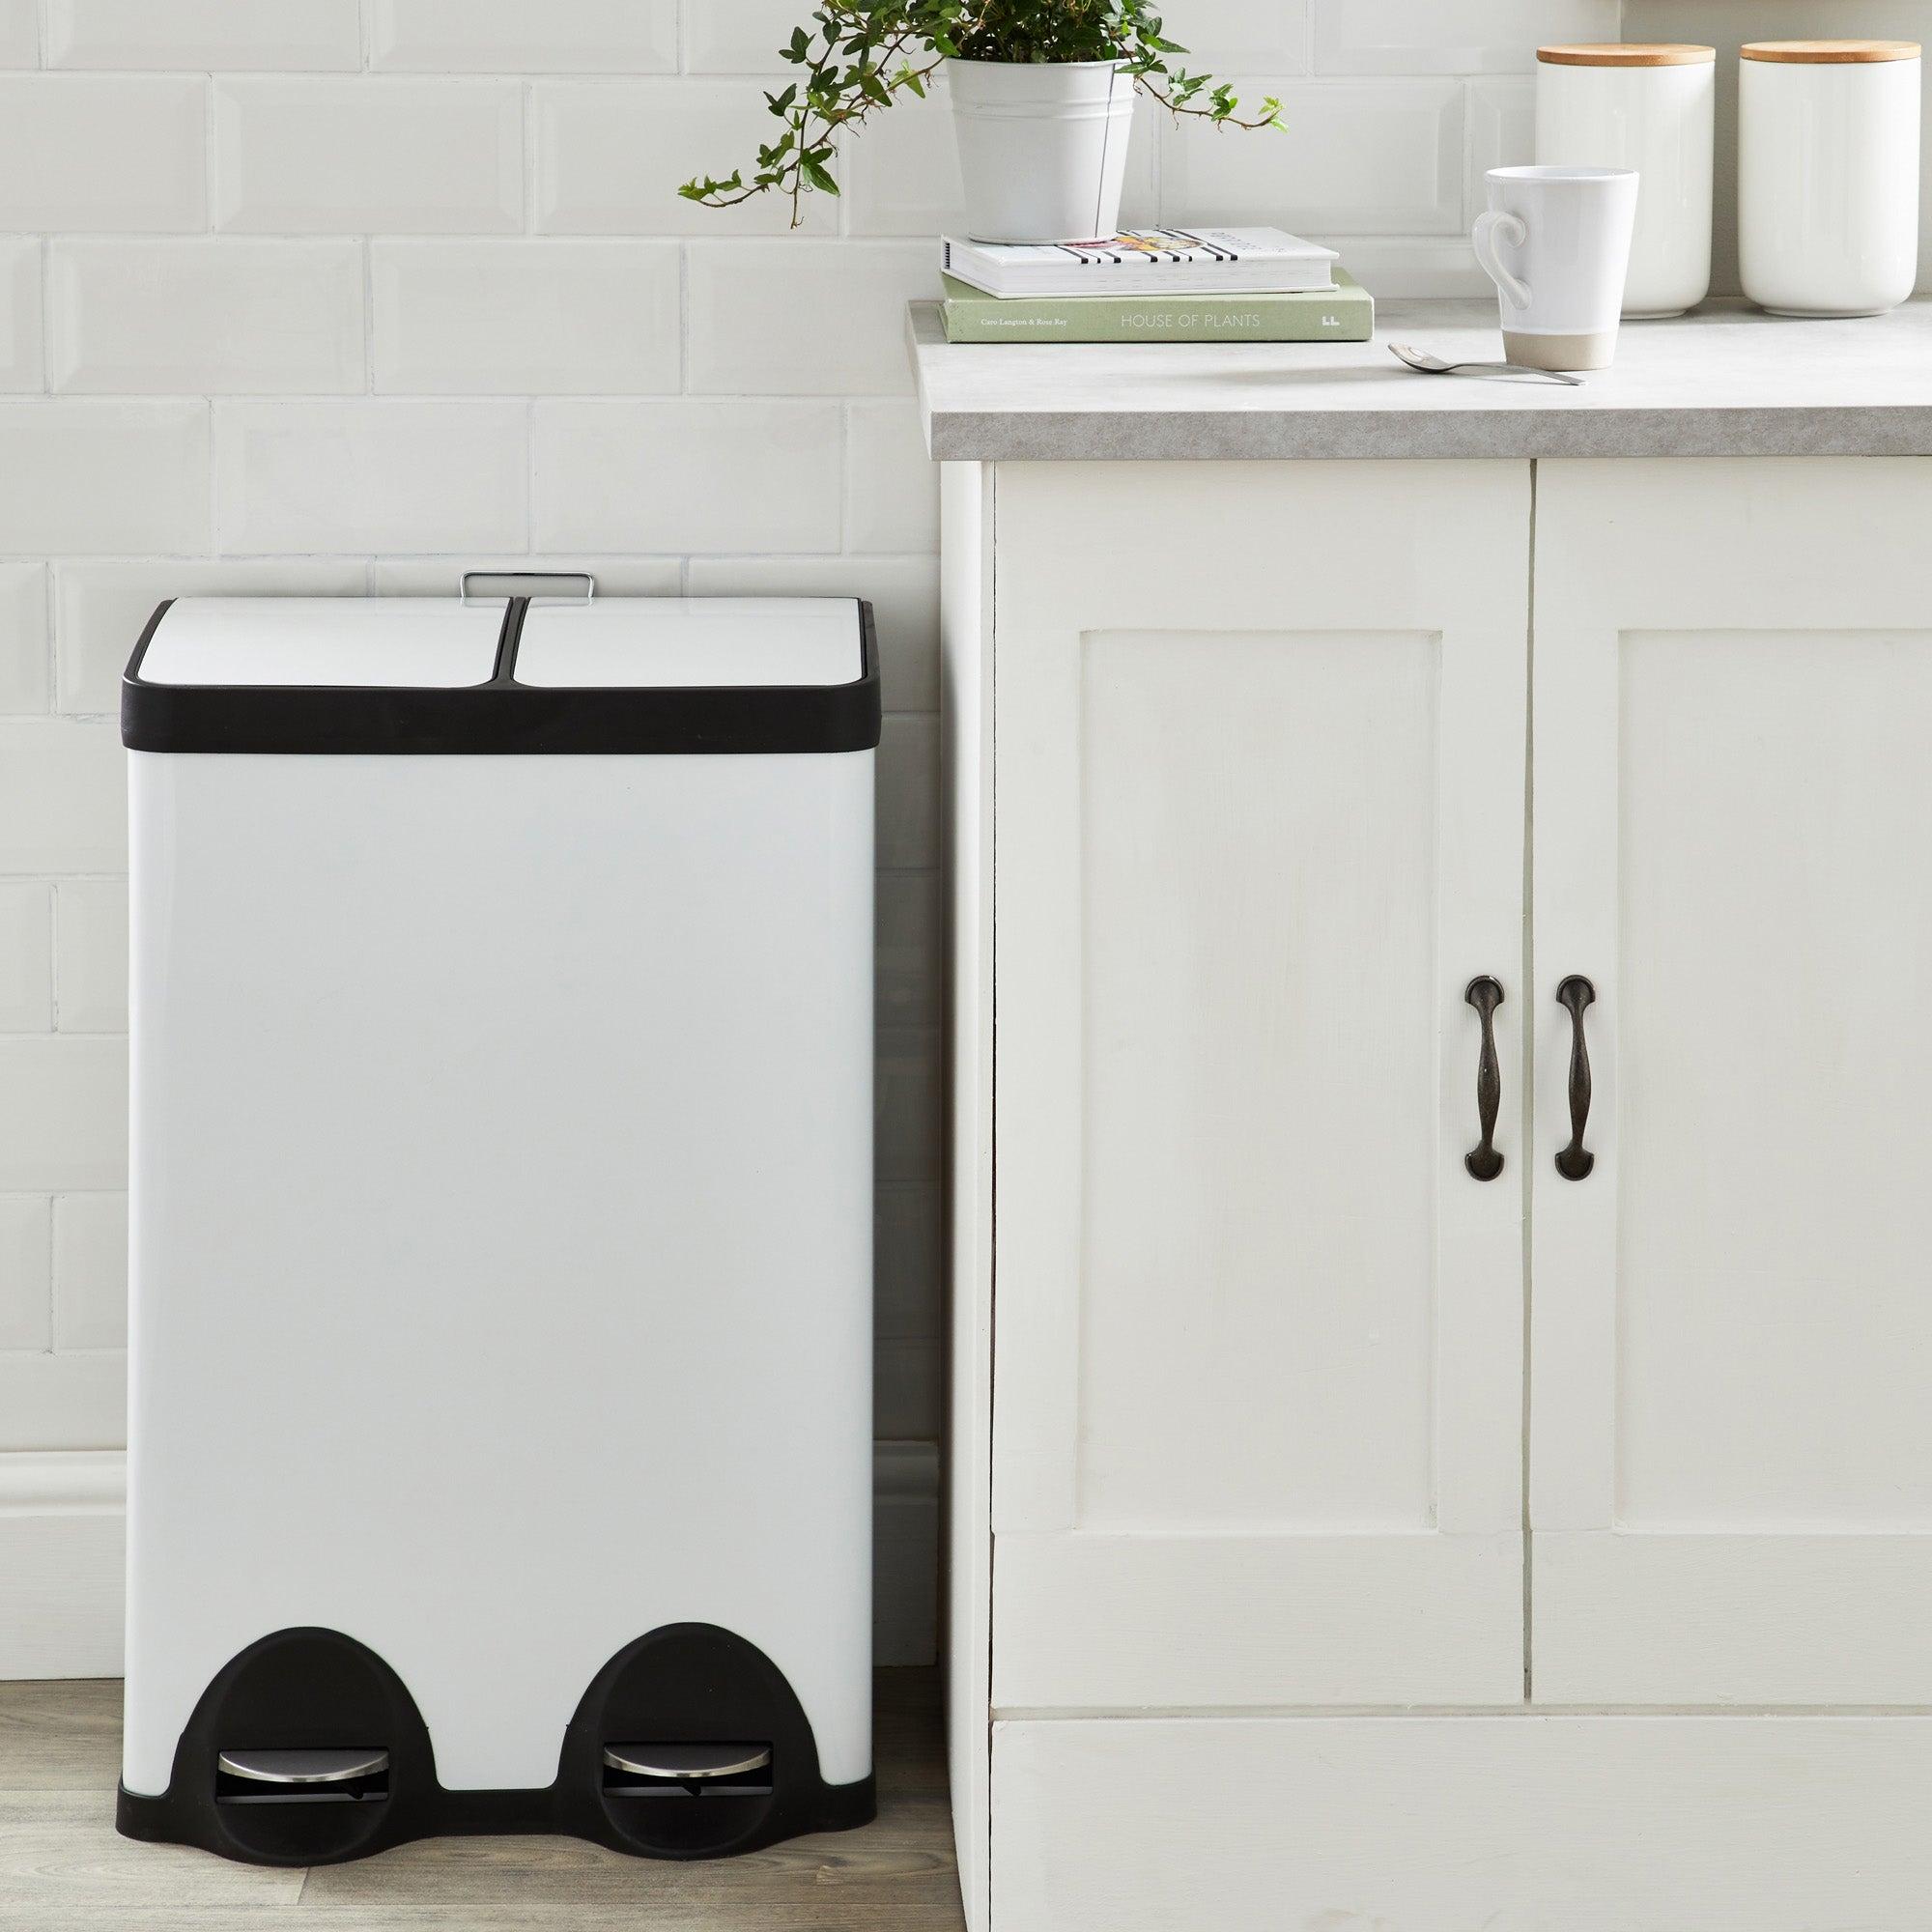 Dunelm 30/30 Litre White Recycling Bin White